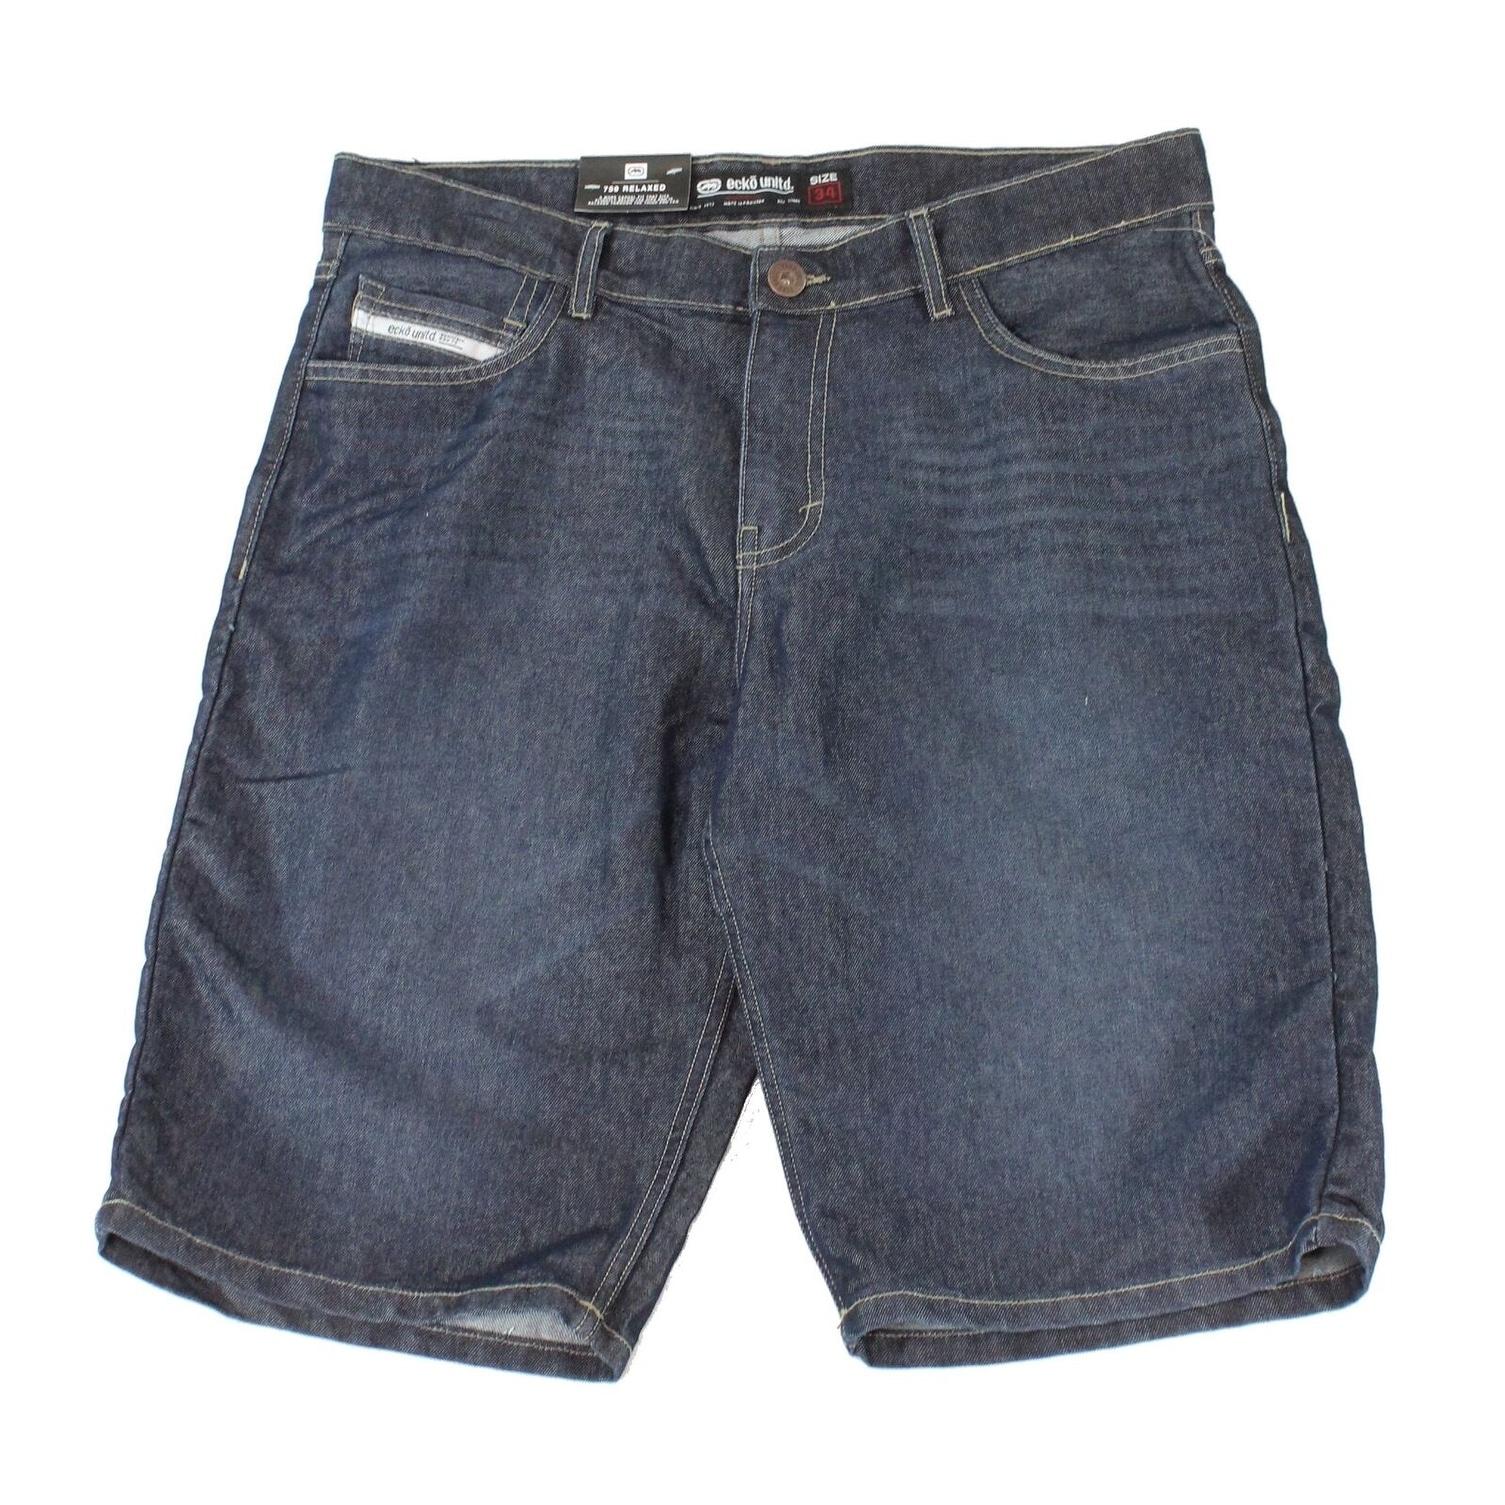 Ecko Unltd Mens Shorts Black Size 38 Denim 759 Relaxed Fit Seamed $58 #308